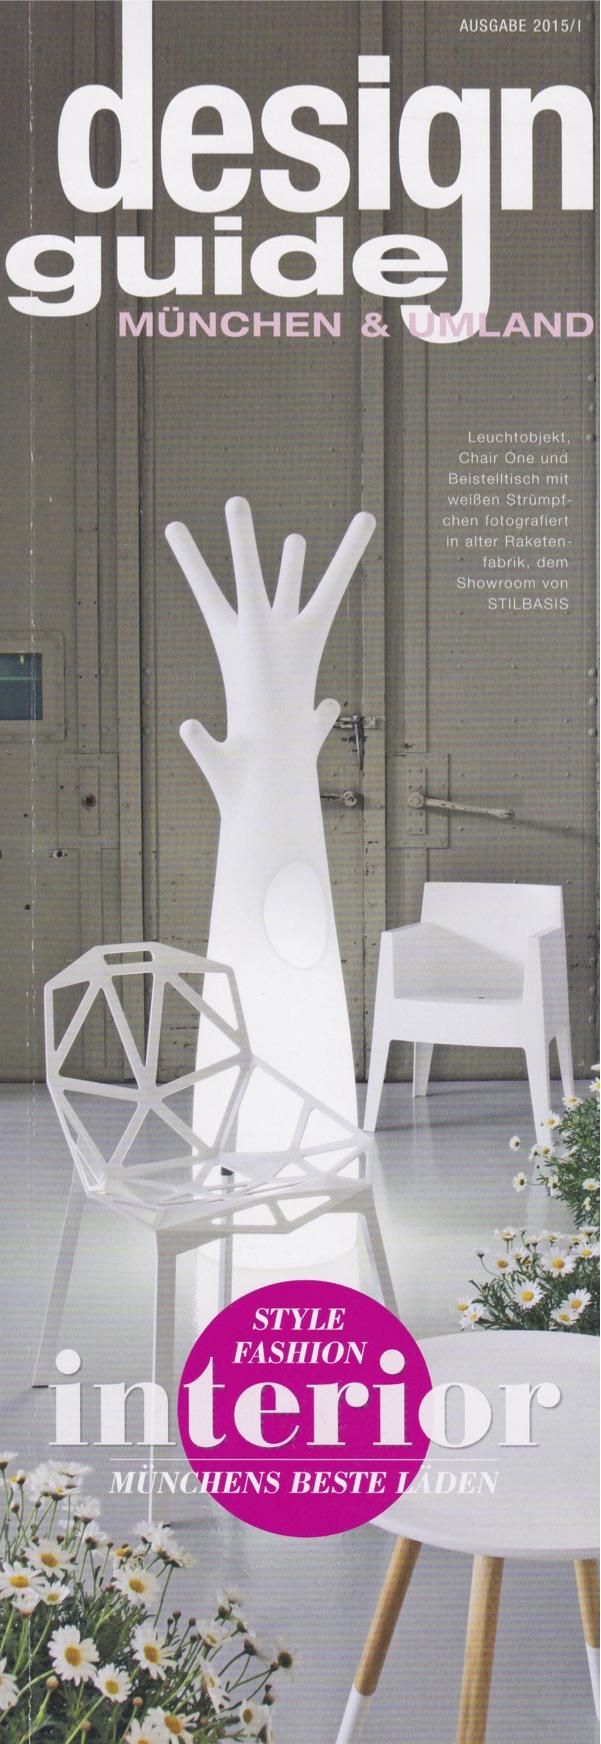 Yasemin Loher im Design Guide München 01-2015